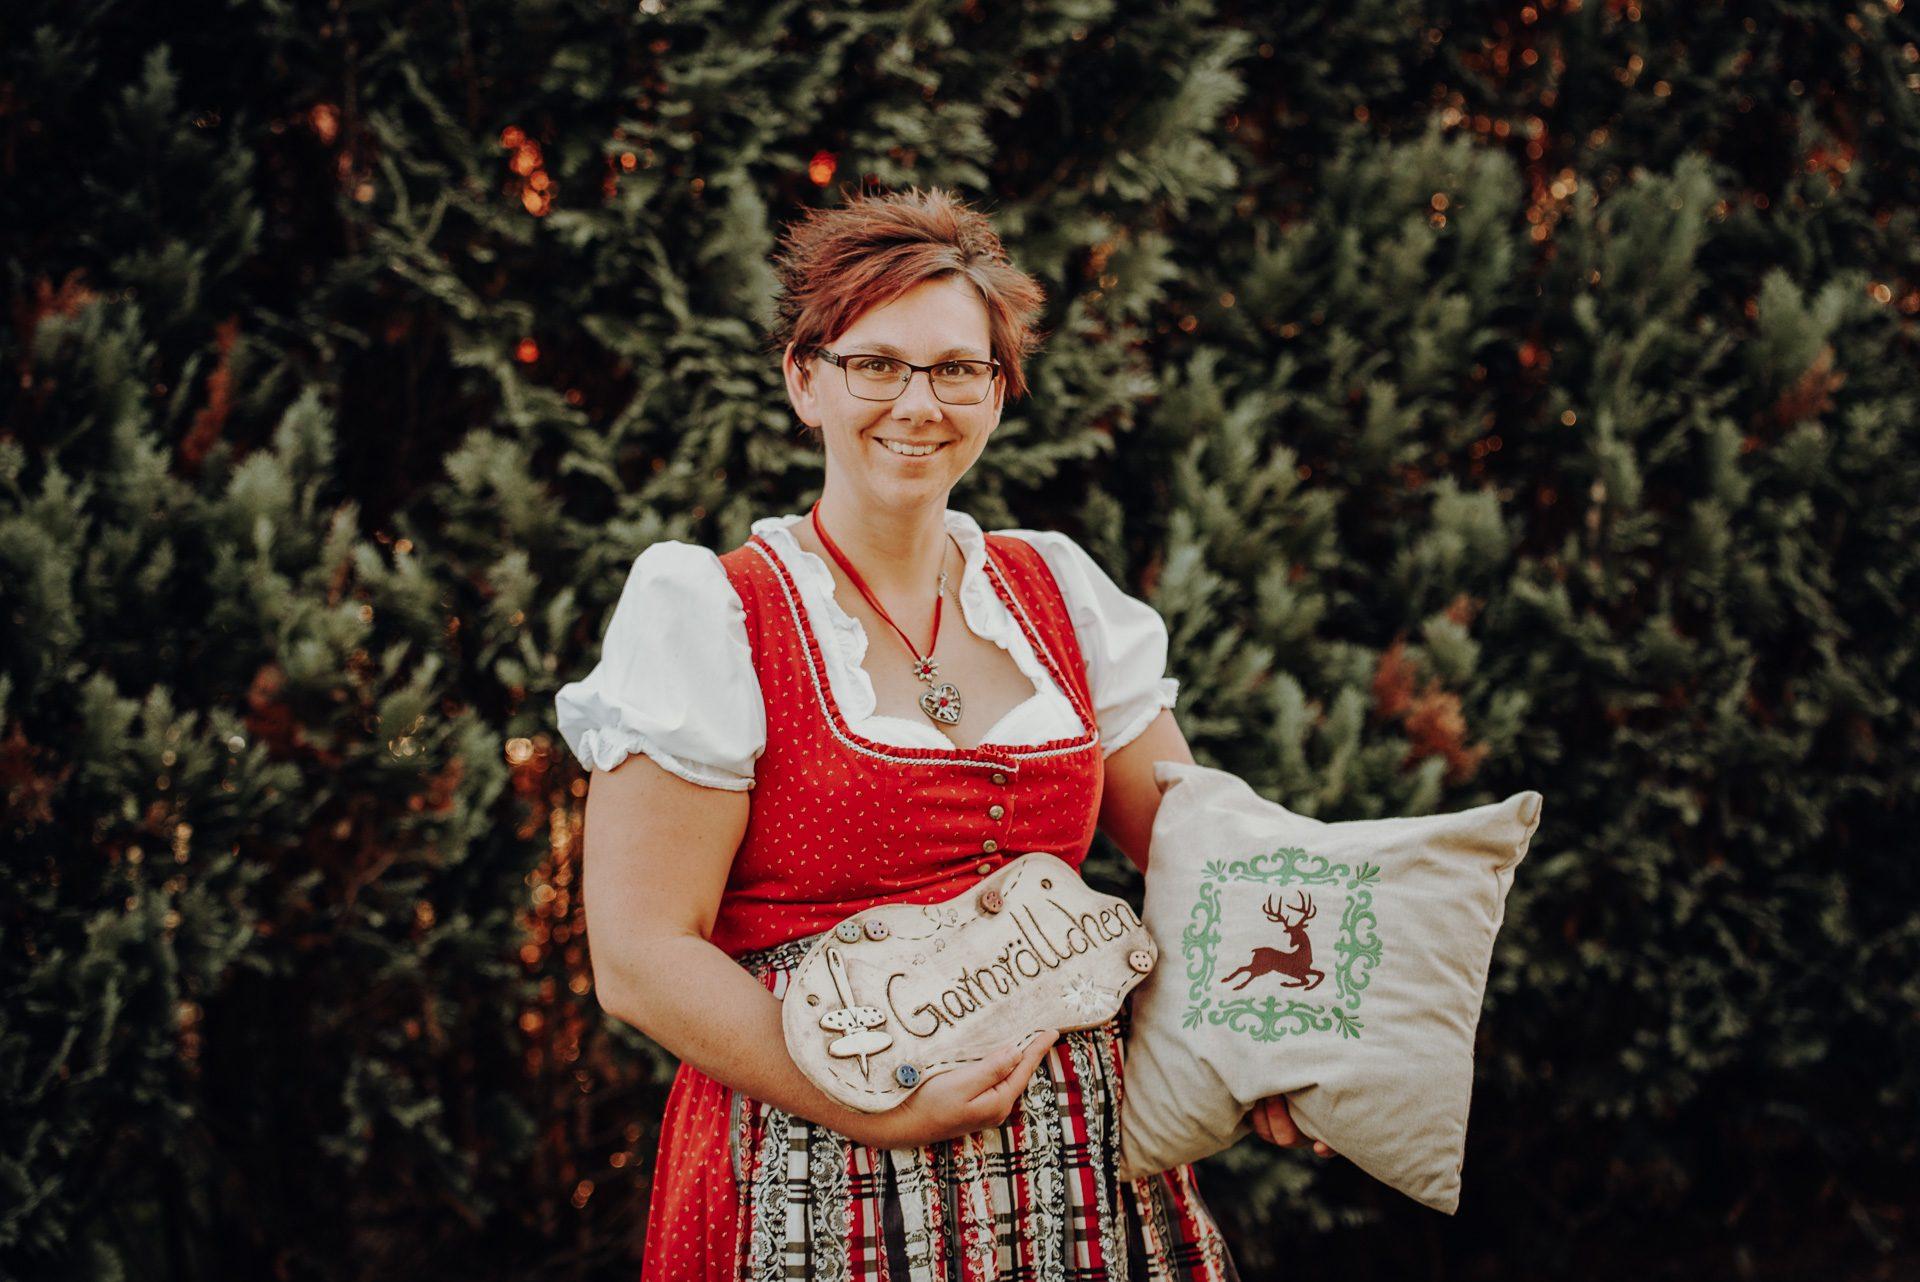 Garnröllchen Anja Neuber